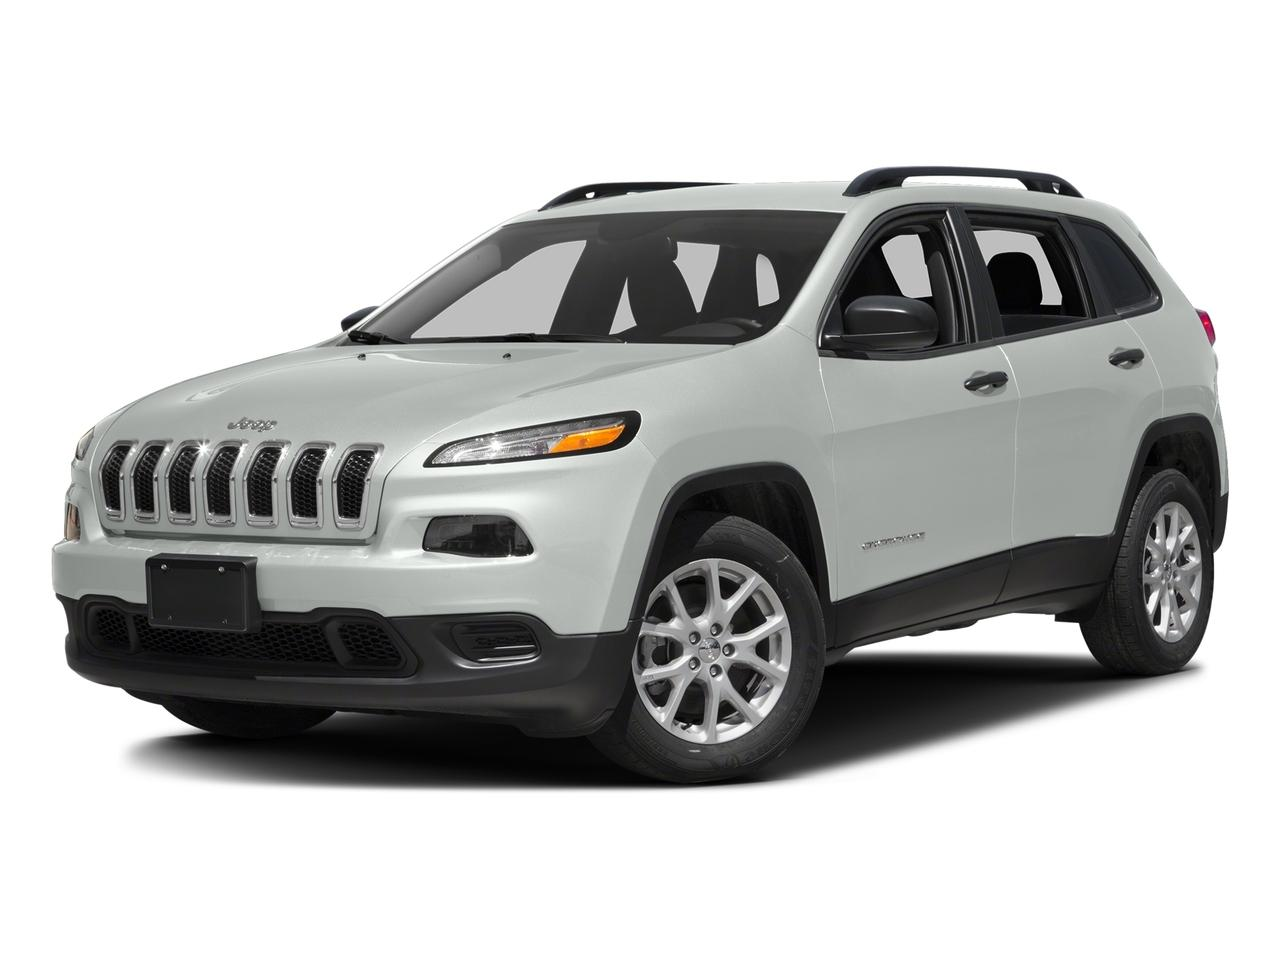 2017 Jeep Cherokee Vehicle Photo in Colma, CA 94014